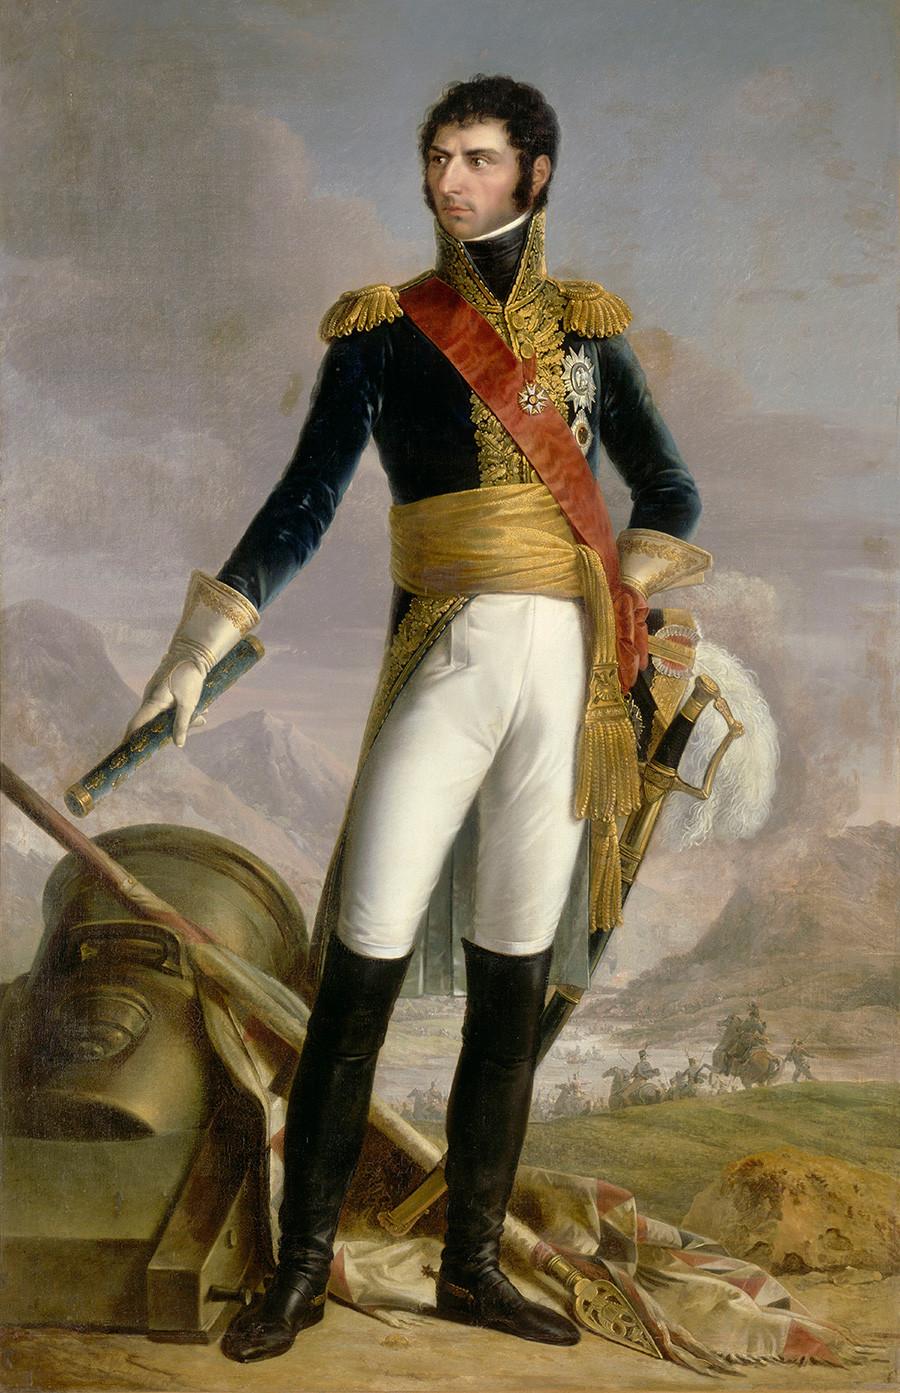 Jean Baptiste Bernadotte, marechal da França, rei da Suécia e da Noruega, de Francois Joseph Kinson